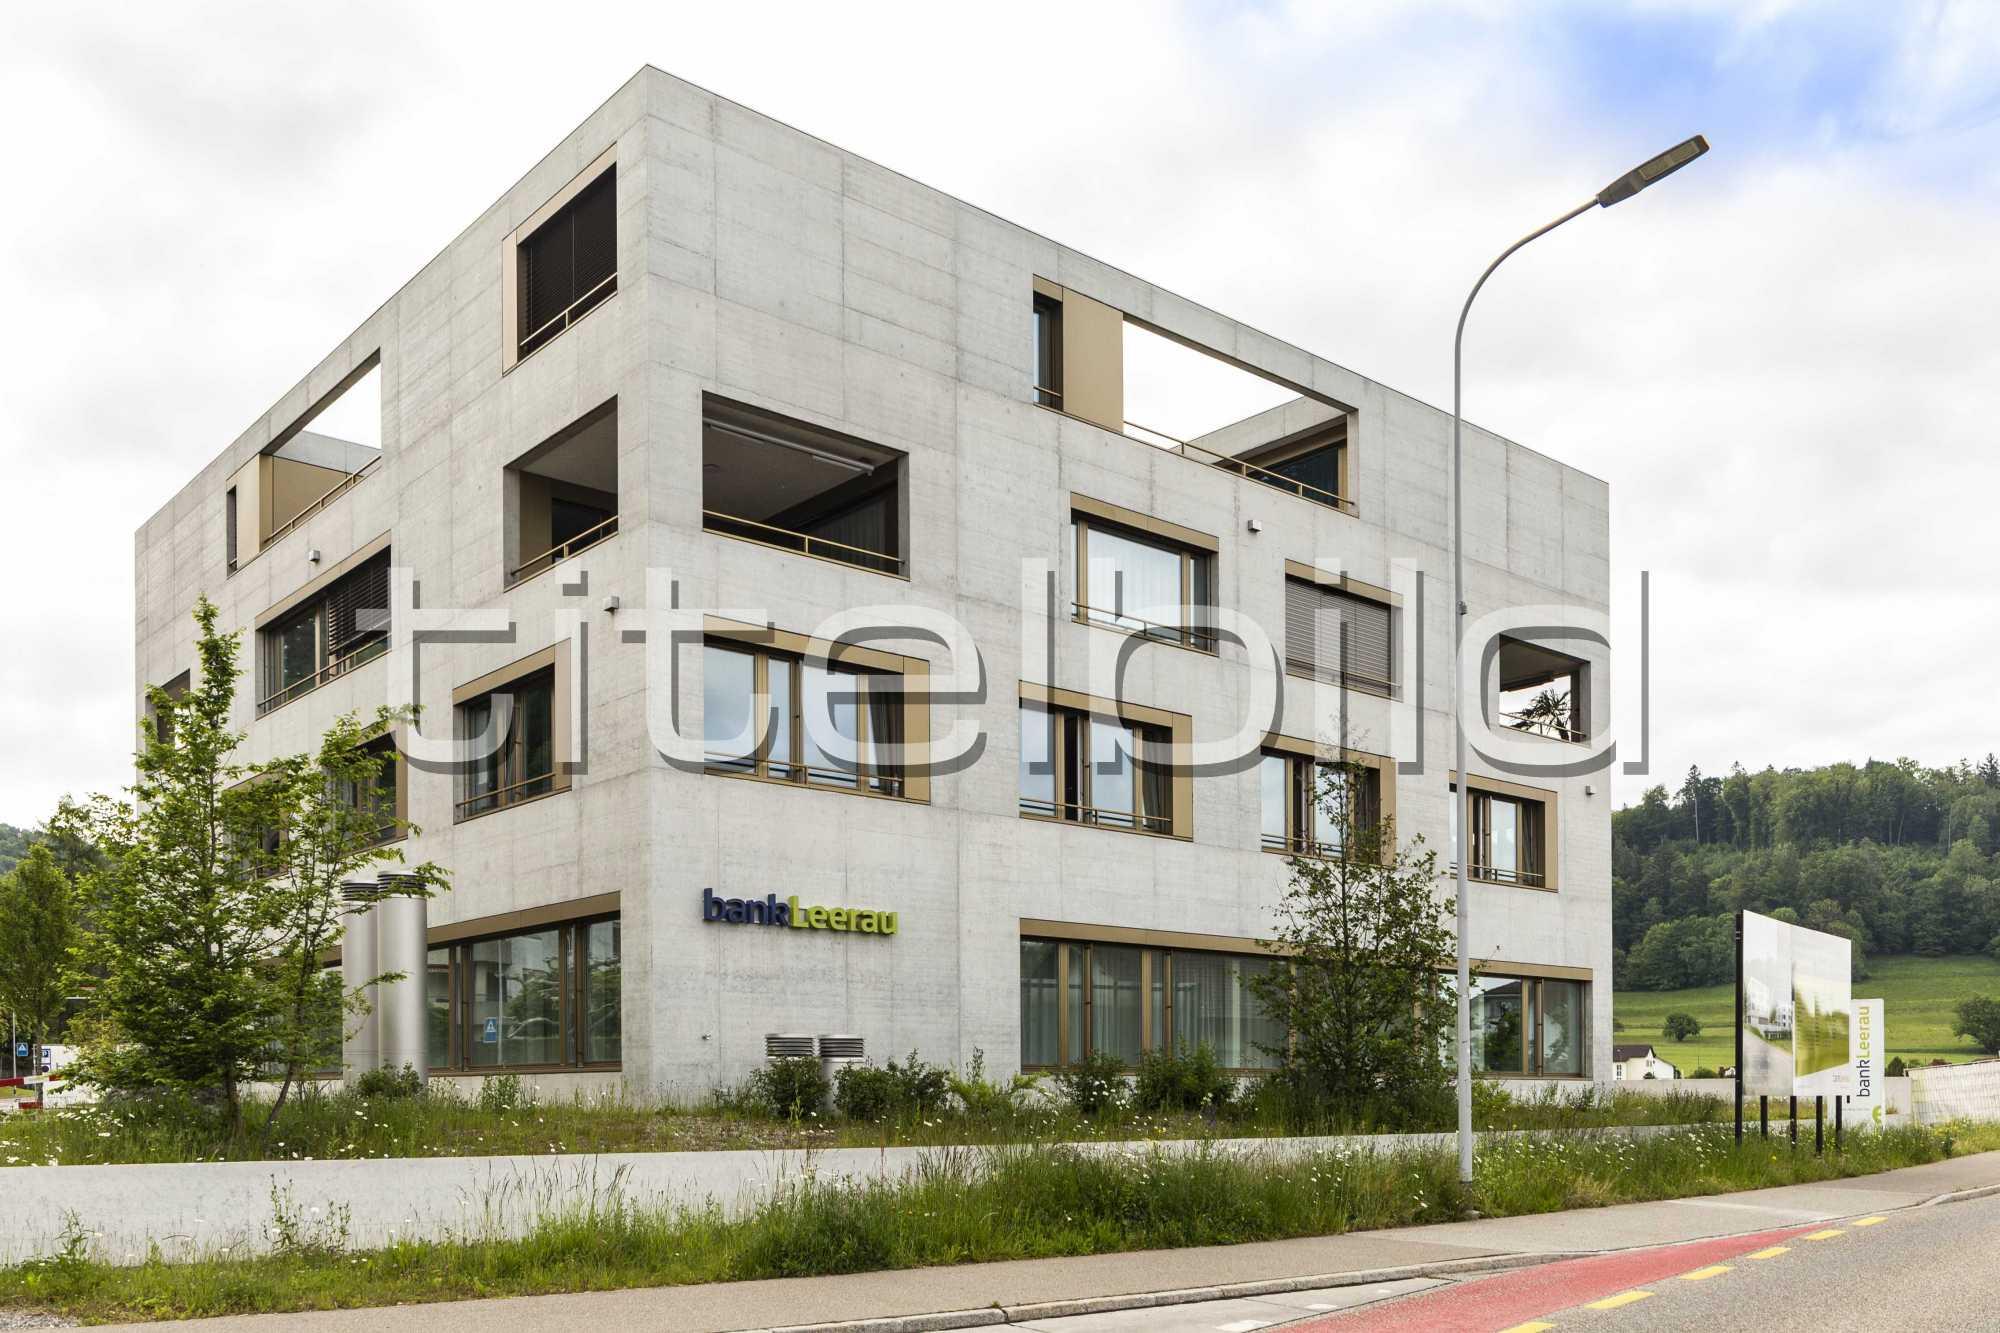 Projektbild-Nr. 1: Bank Leerau, Zentrum-Haus A, Kirchleerau